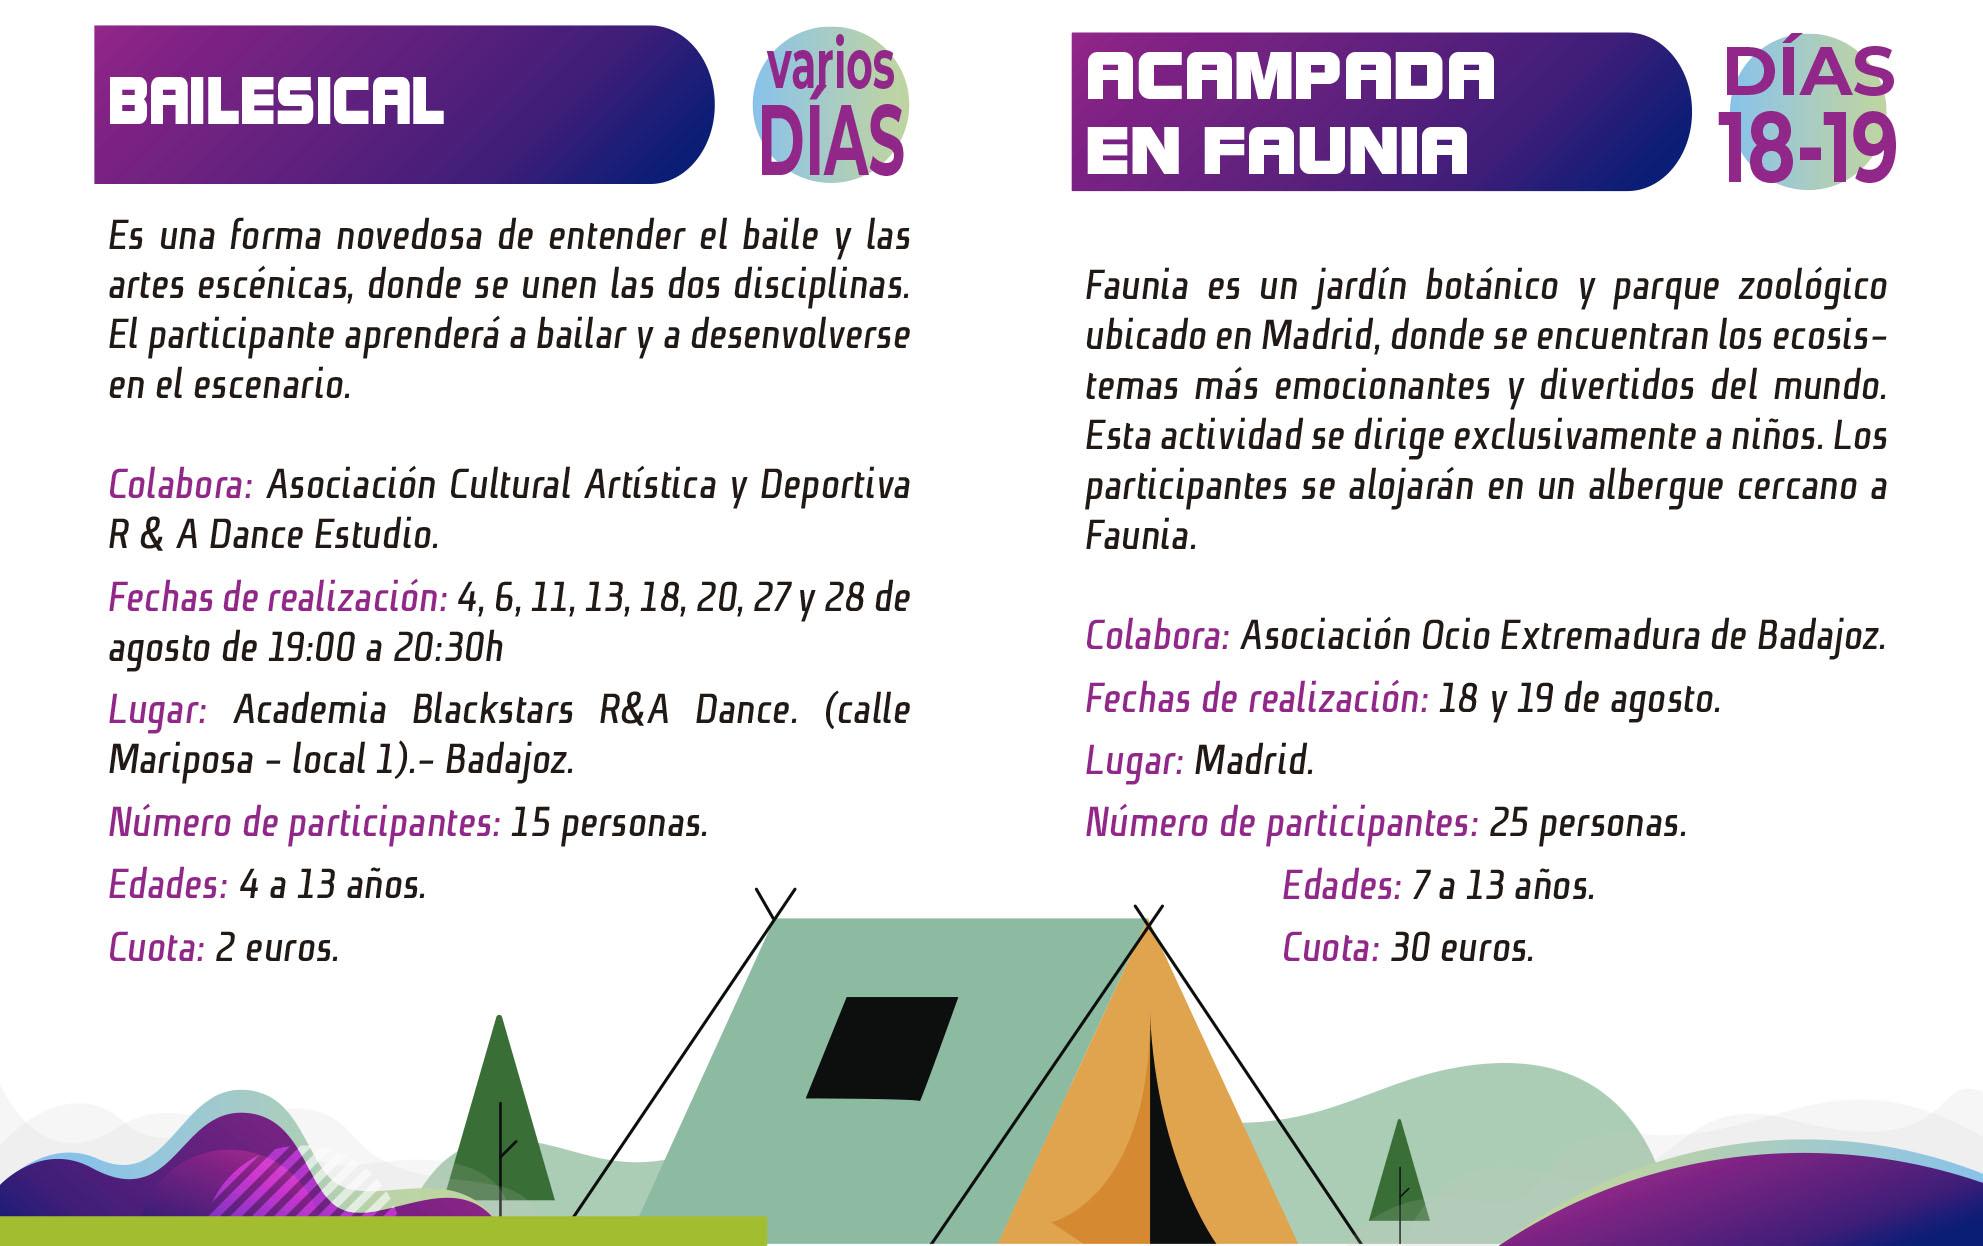 programa_vive_el_verano_en_badajoz_2020 (1)-6